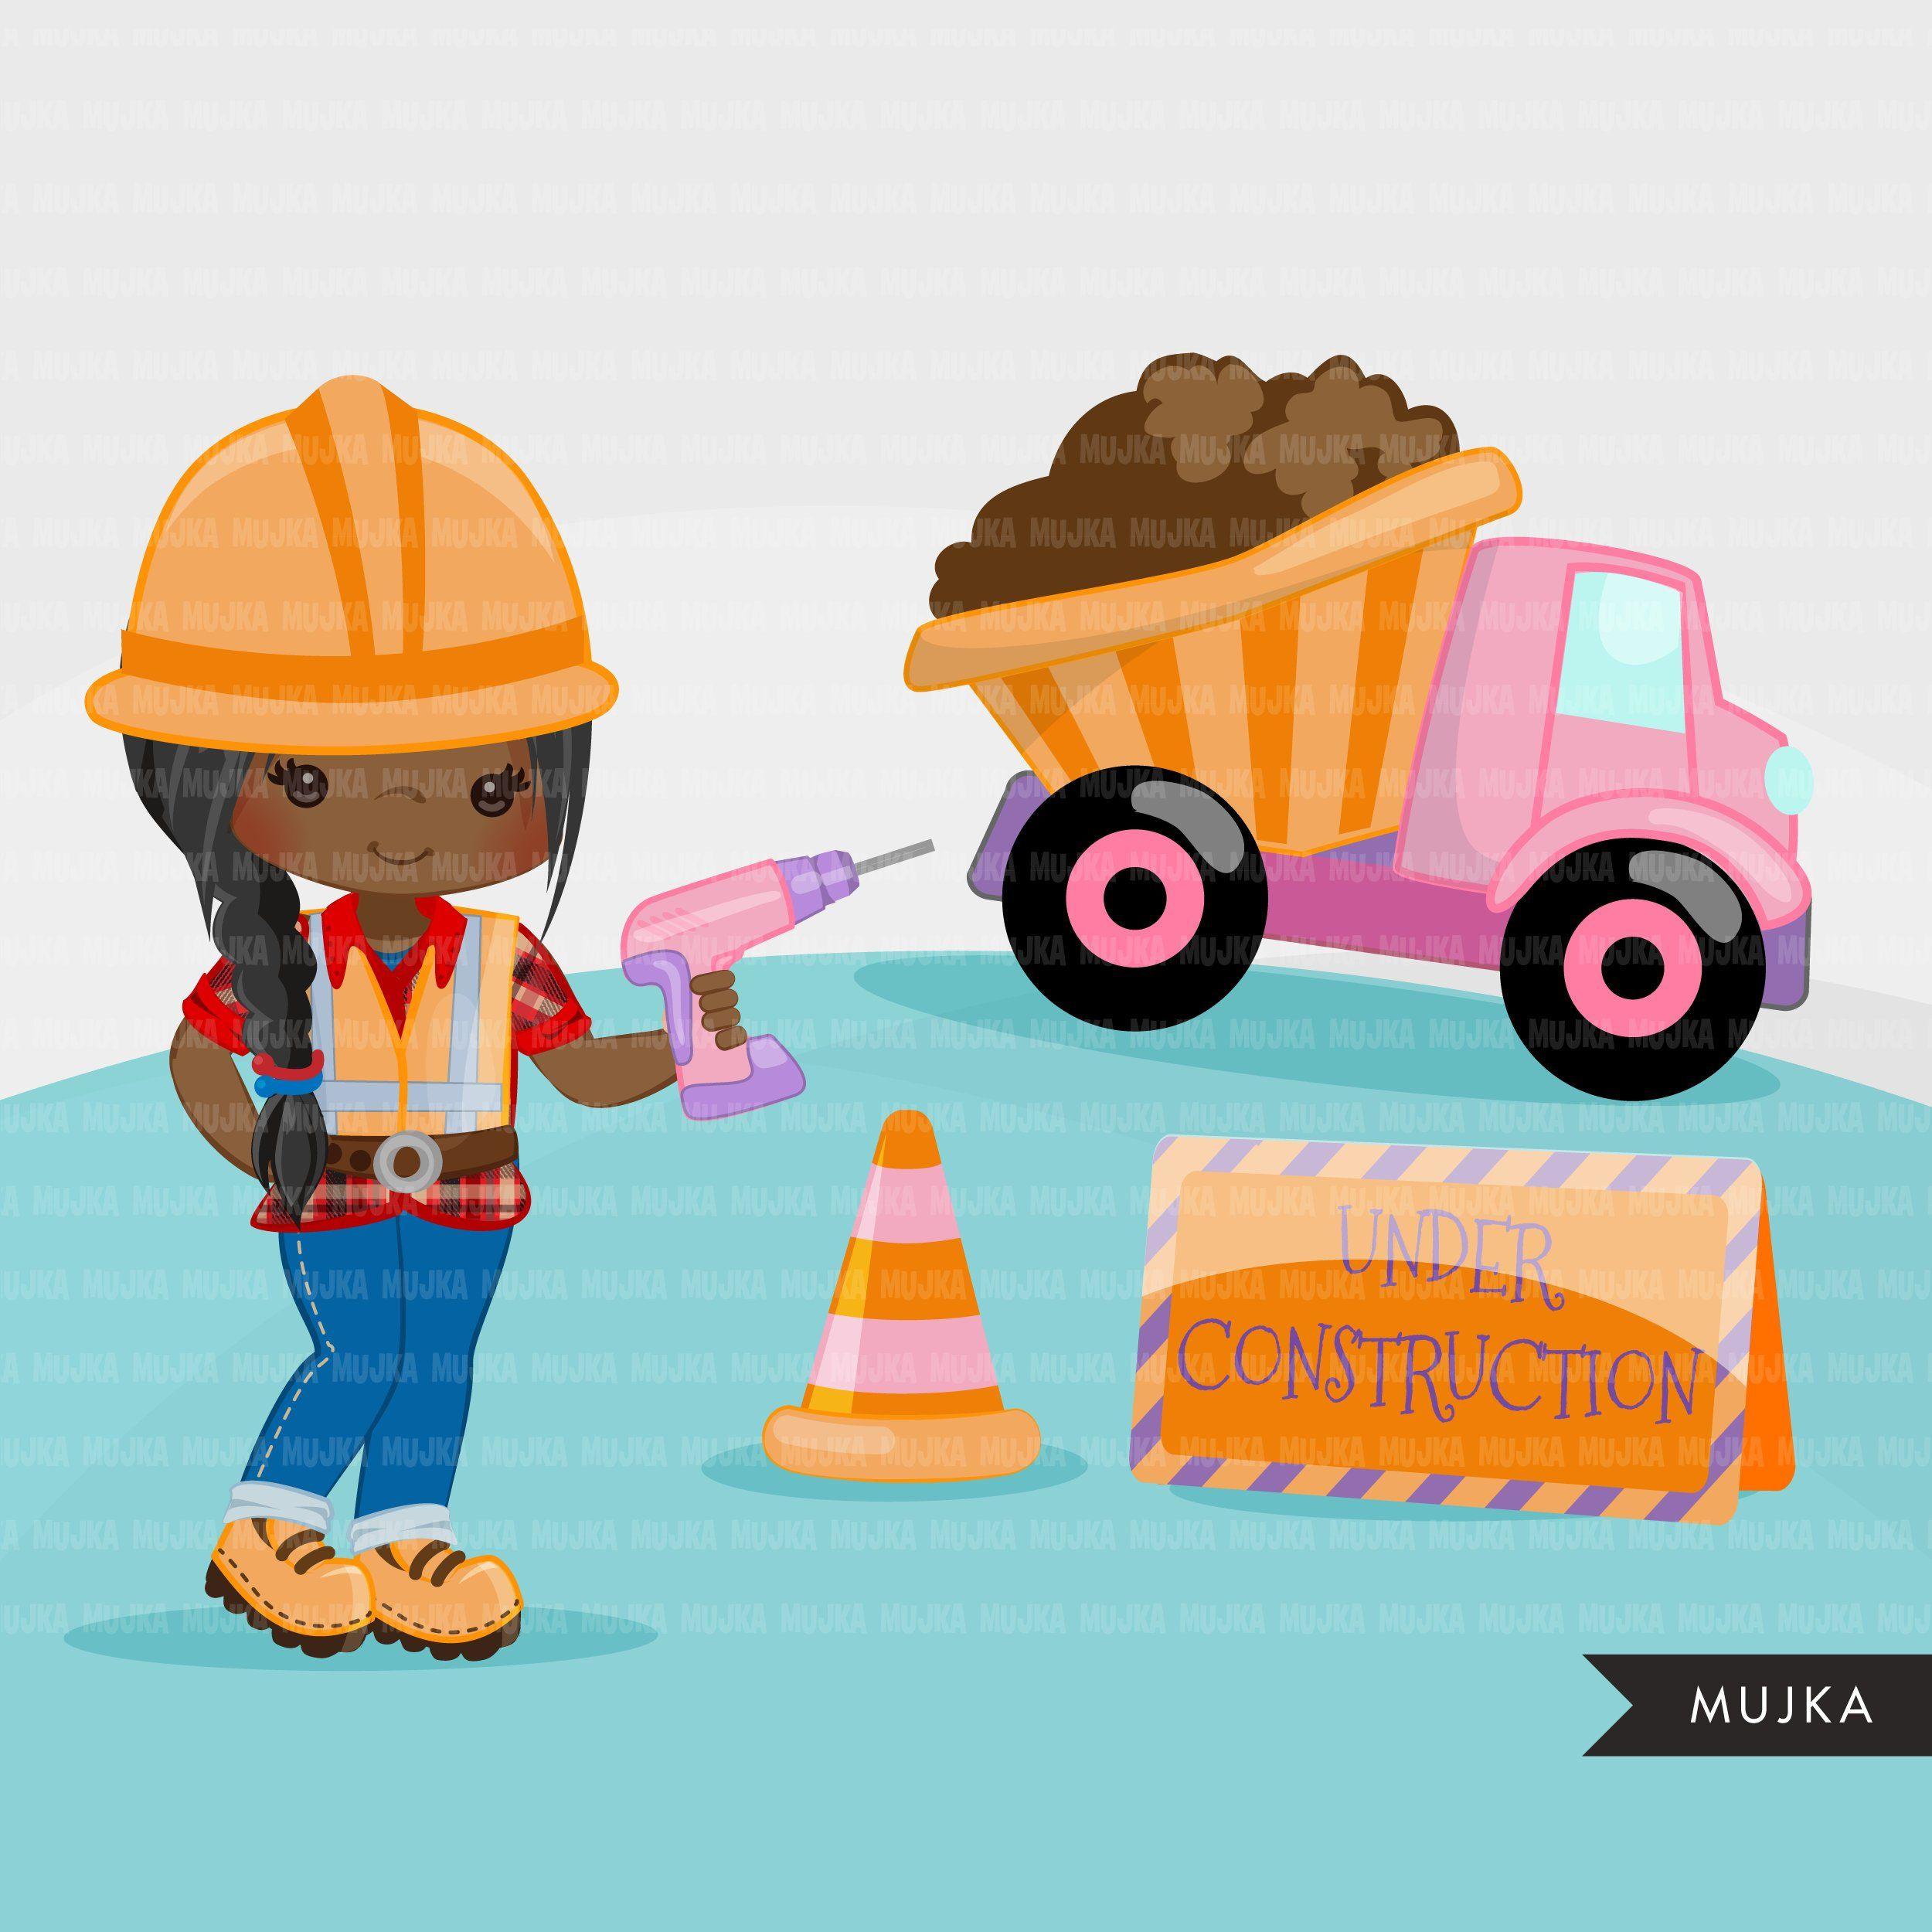 Construction Clipart Little Girl Contractor Hard Hat Dump Truck Crane Excavator Bulldozer Vehicle Tools Drill Safety Jacket Scrapbooking Set Digital Embroidery Dump Truck